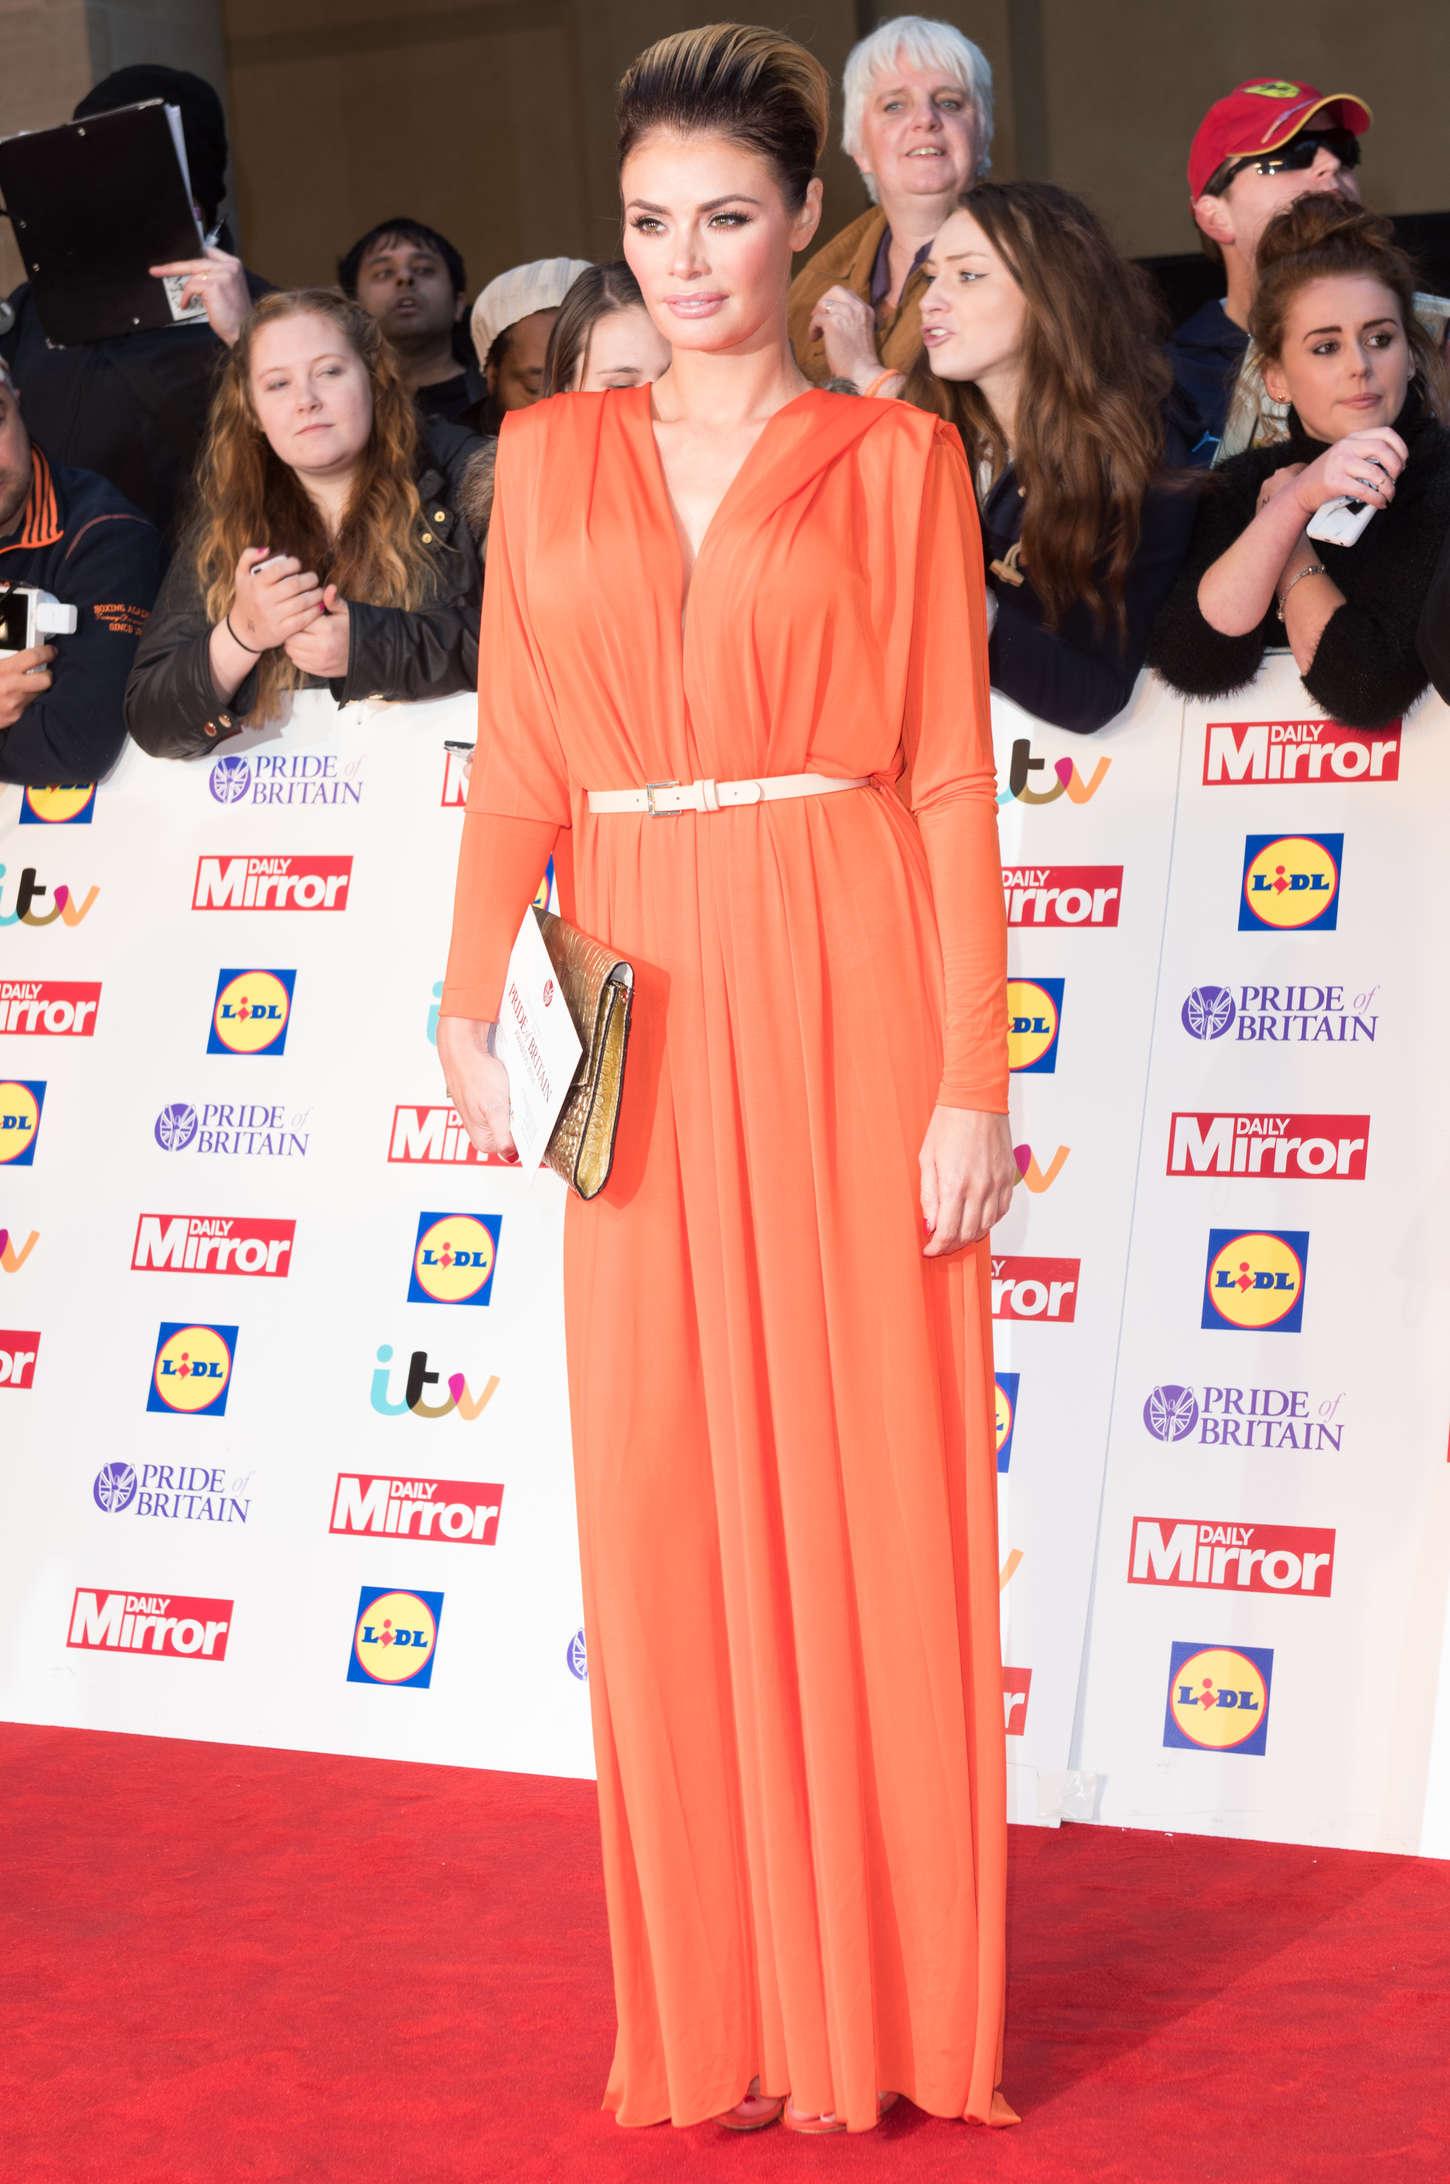 Chloe Sims Pride of Britain Awards in London